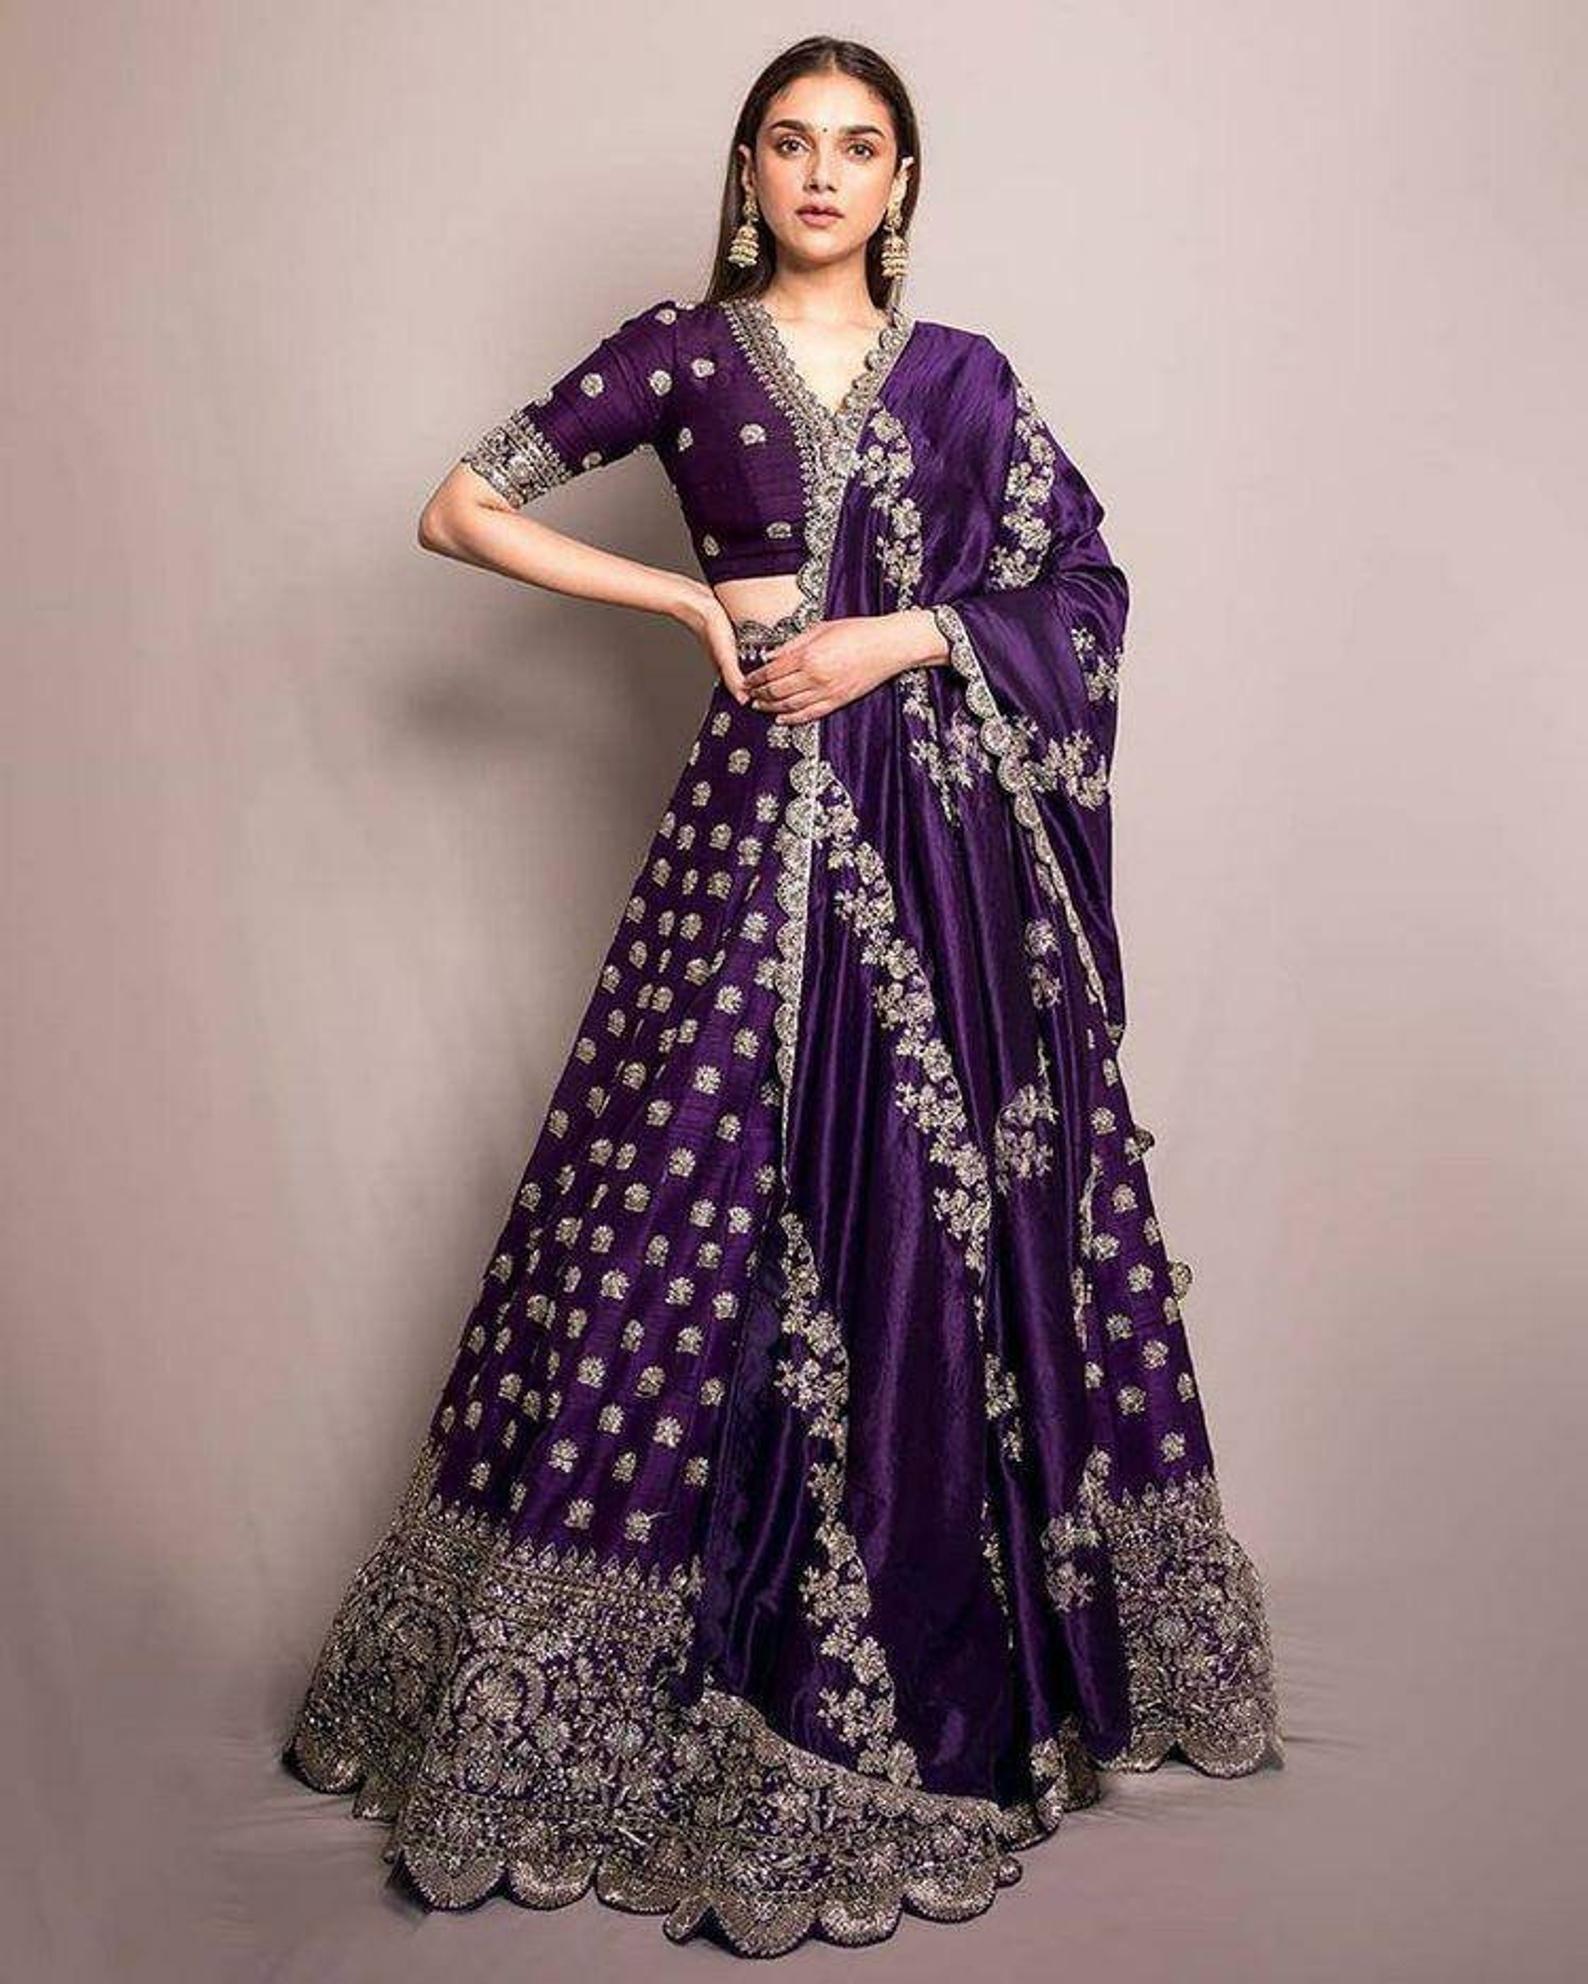 purple lehengas designer lengha sequence lengha chaniya choli party wear indian lehenga wedding wear lehenga for women kid/'s lengha lenga 1